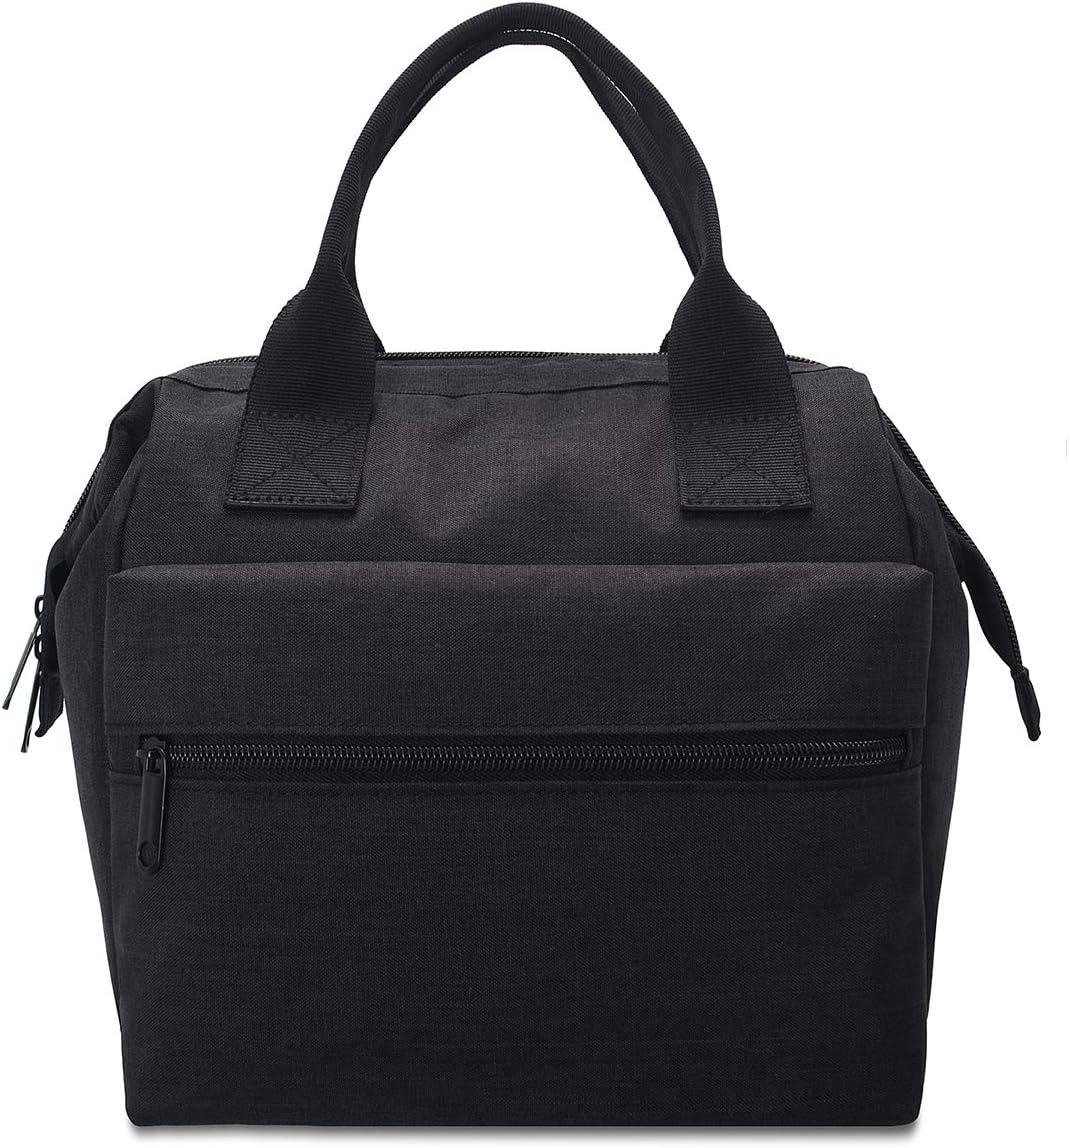 Fawziya 7L Lunch Bag For Men Women And Kids-Black